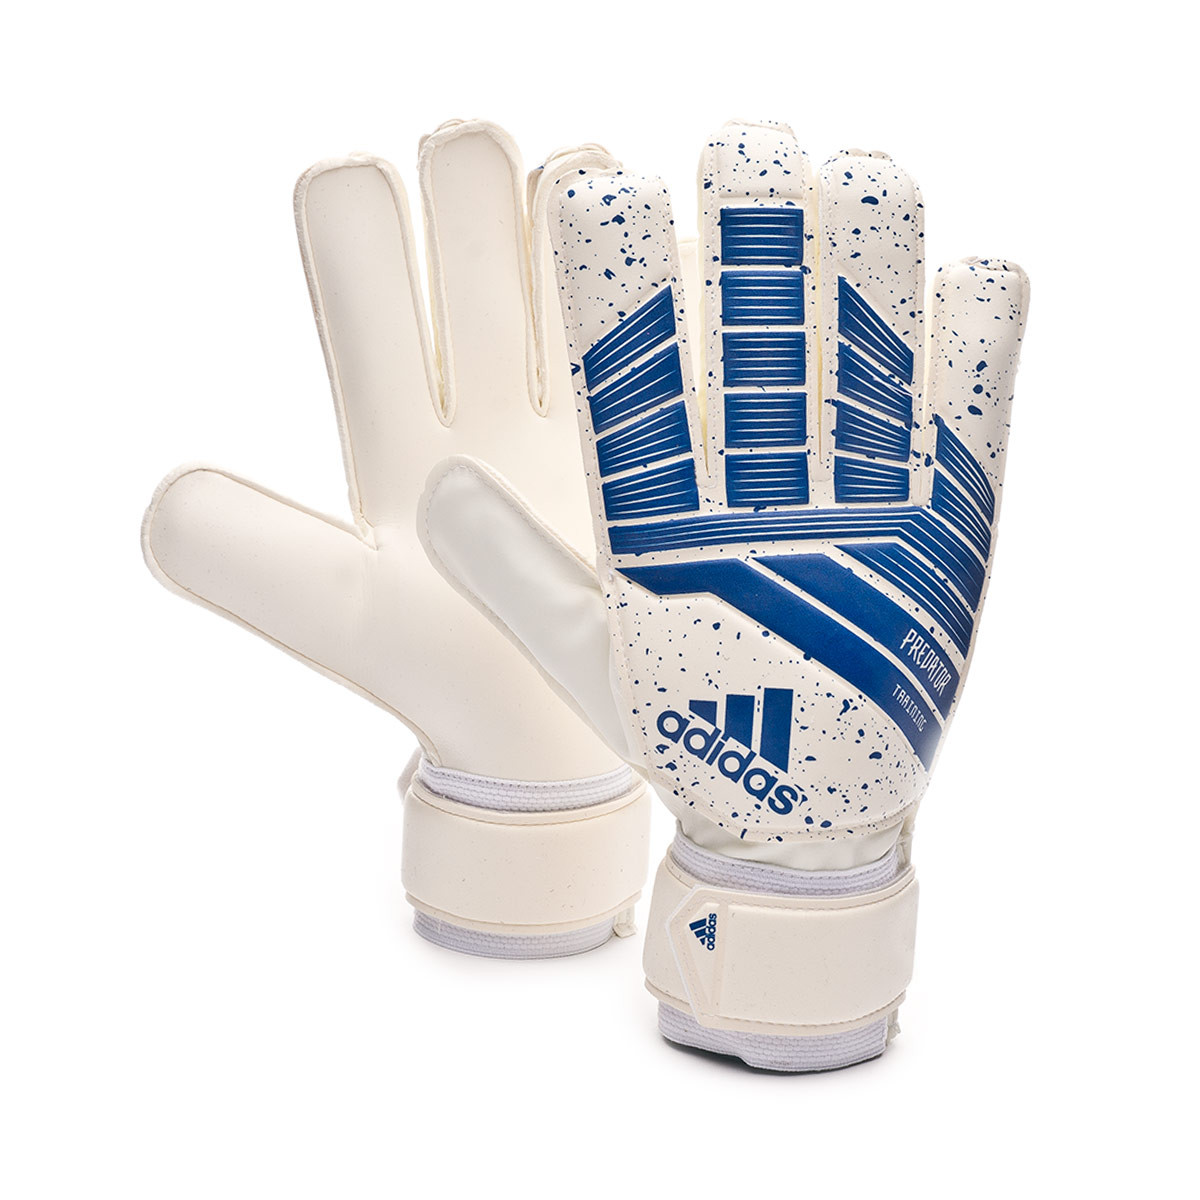 Glove adidas Predator Training Football